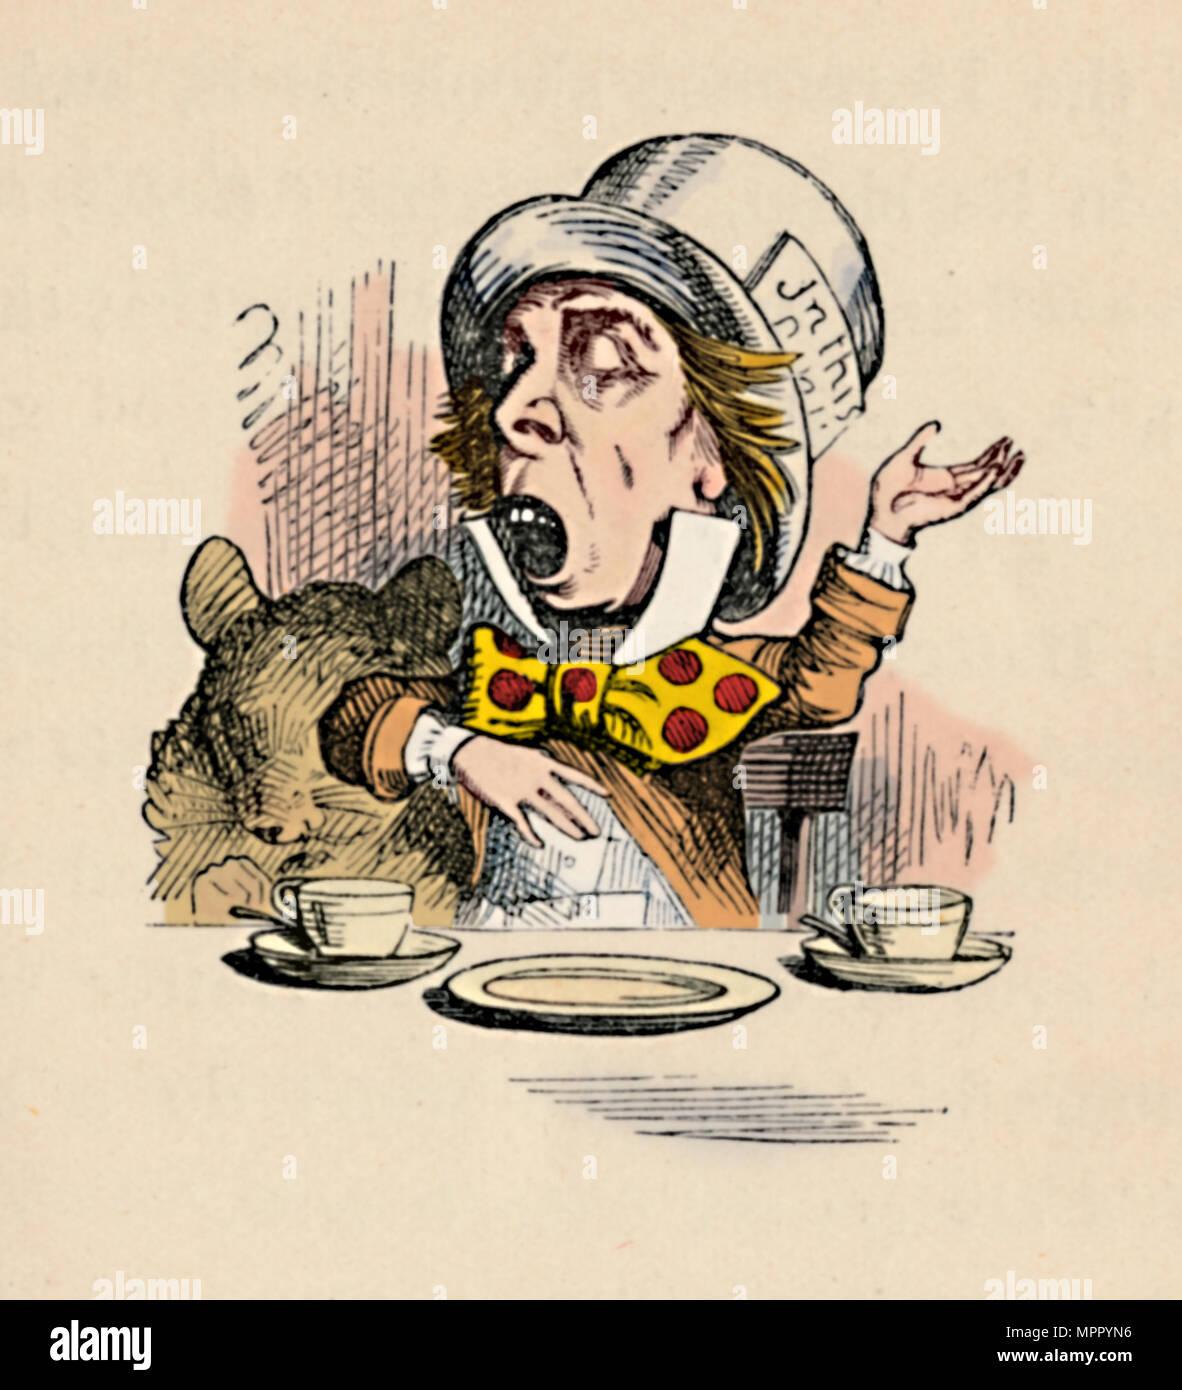 'The Mad Hatter', 1889. Artist: John Tenniel. - Stock Image